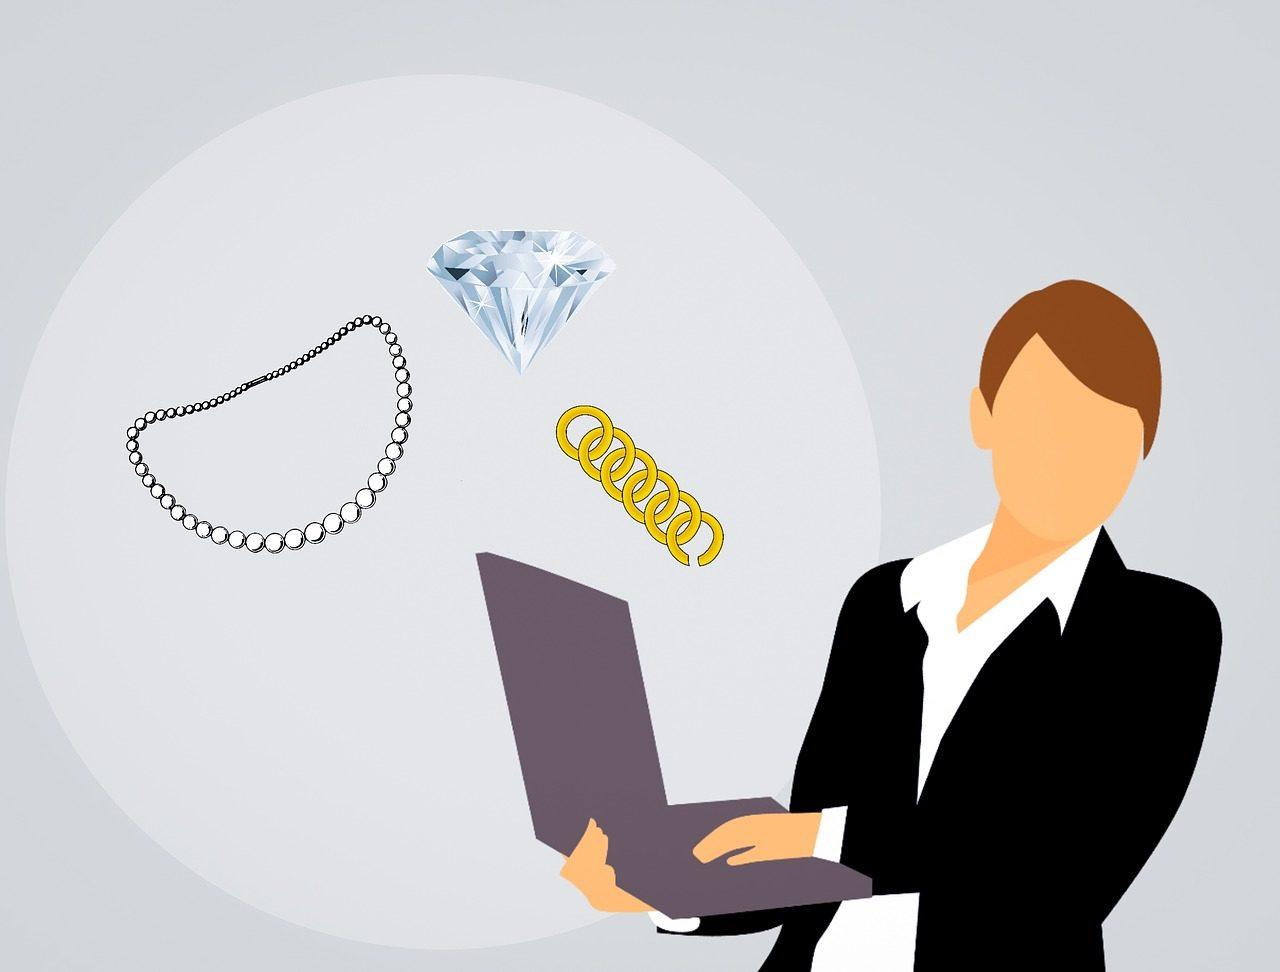 jewelry-3213722_1280-1280x972.jpg